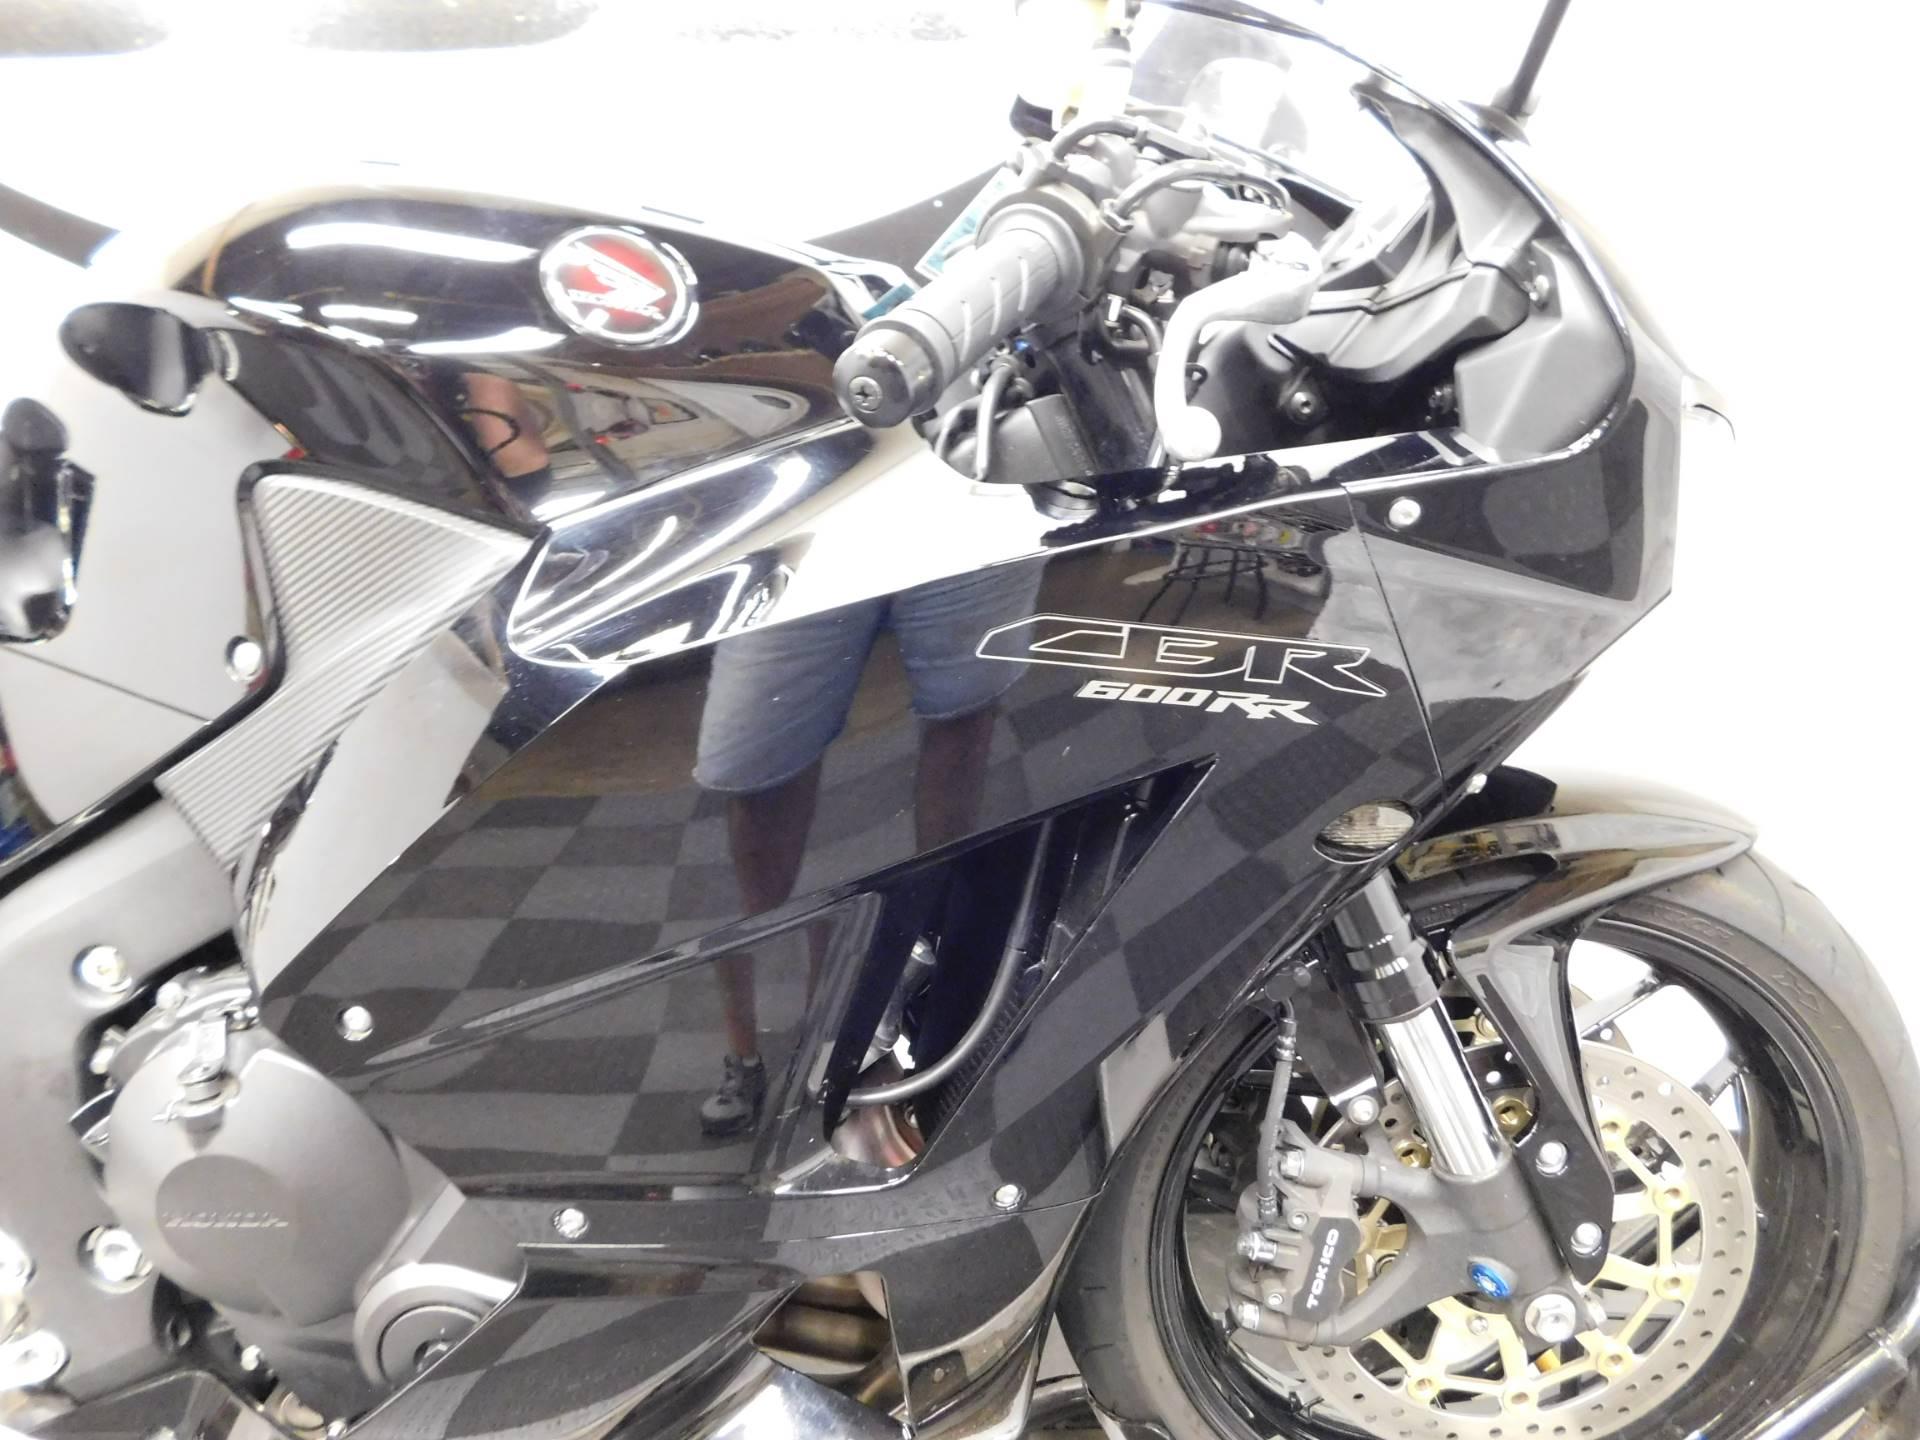 Used 2014 Honda CBR®600RR Motorcycles in Eden Prairie, MN | Stock ...